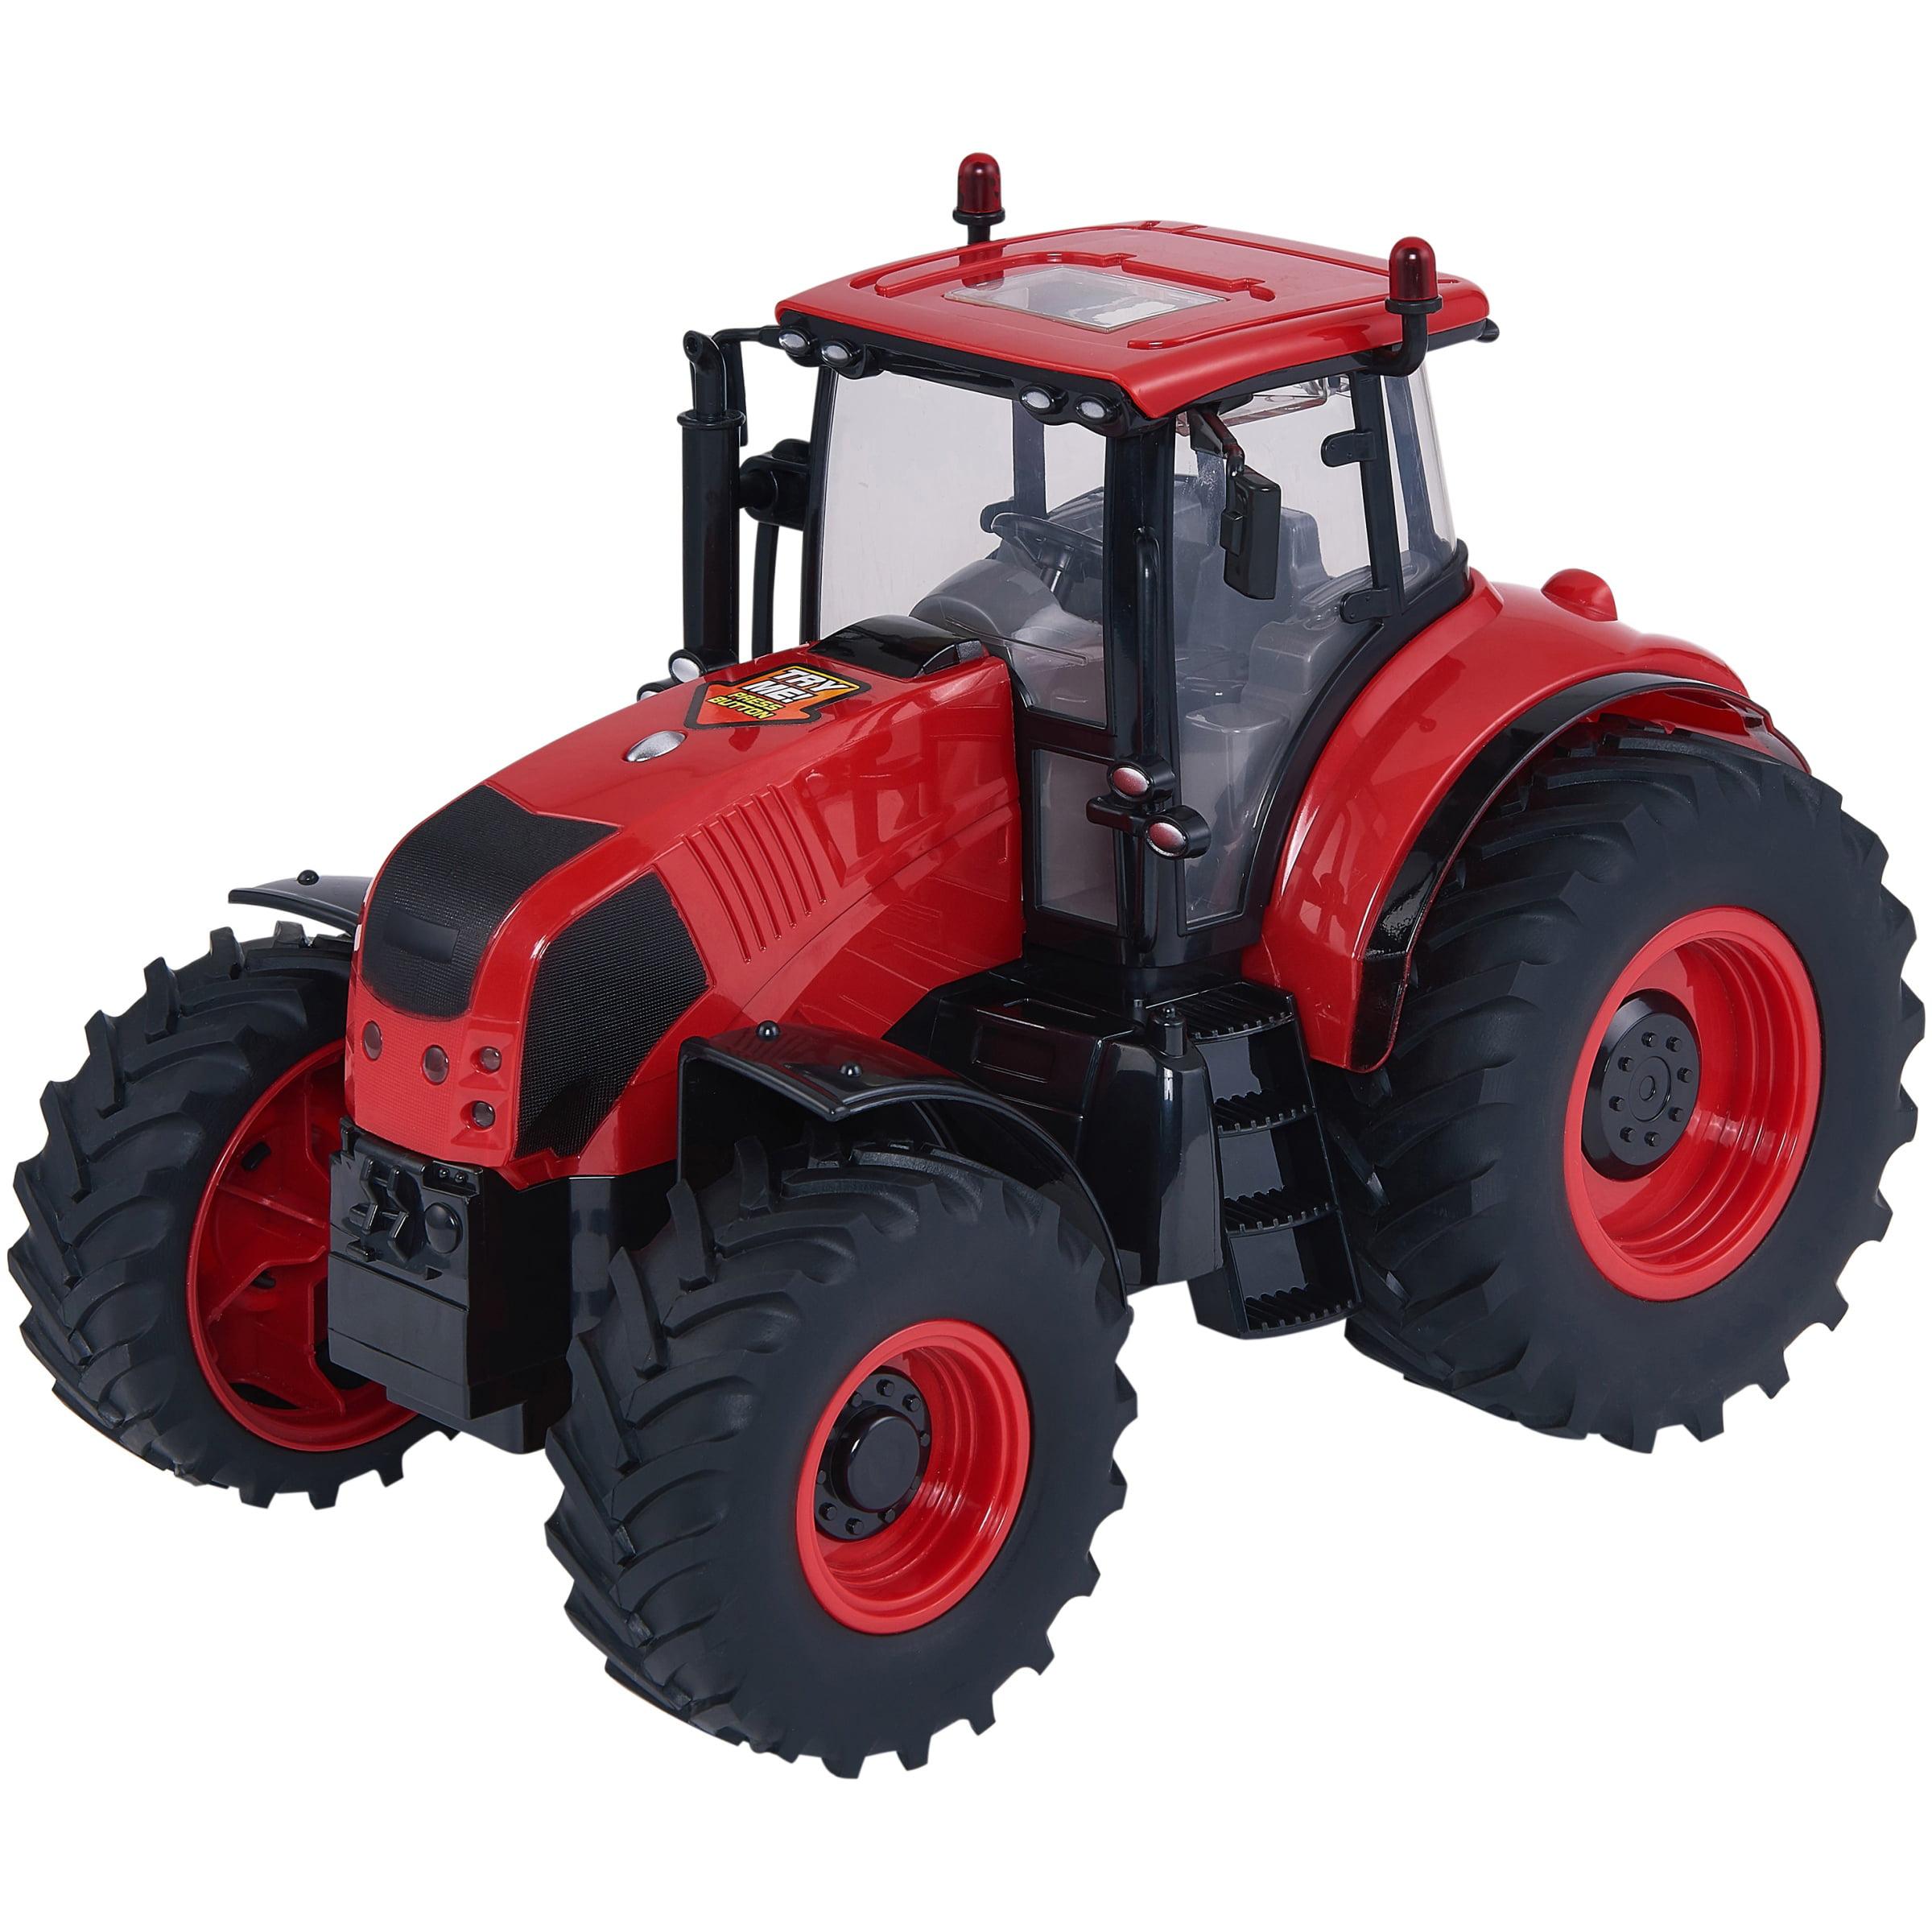 Adventure Force Light & Sound Farm Tractor, Red by Boley International (HK) Ltd.